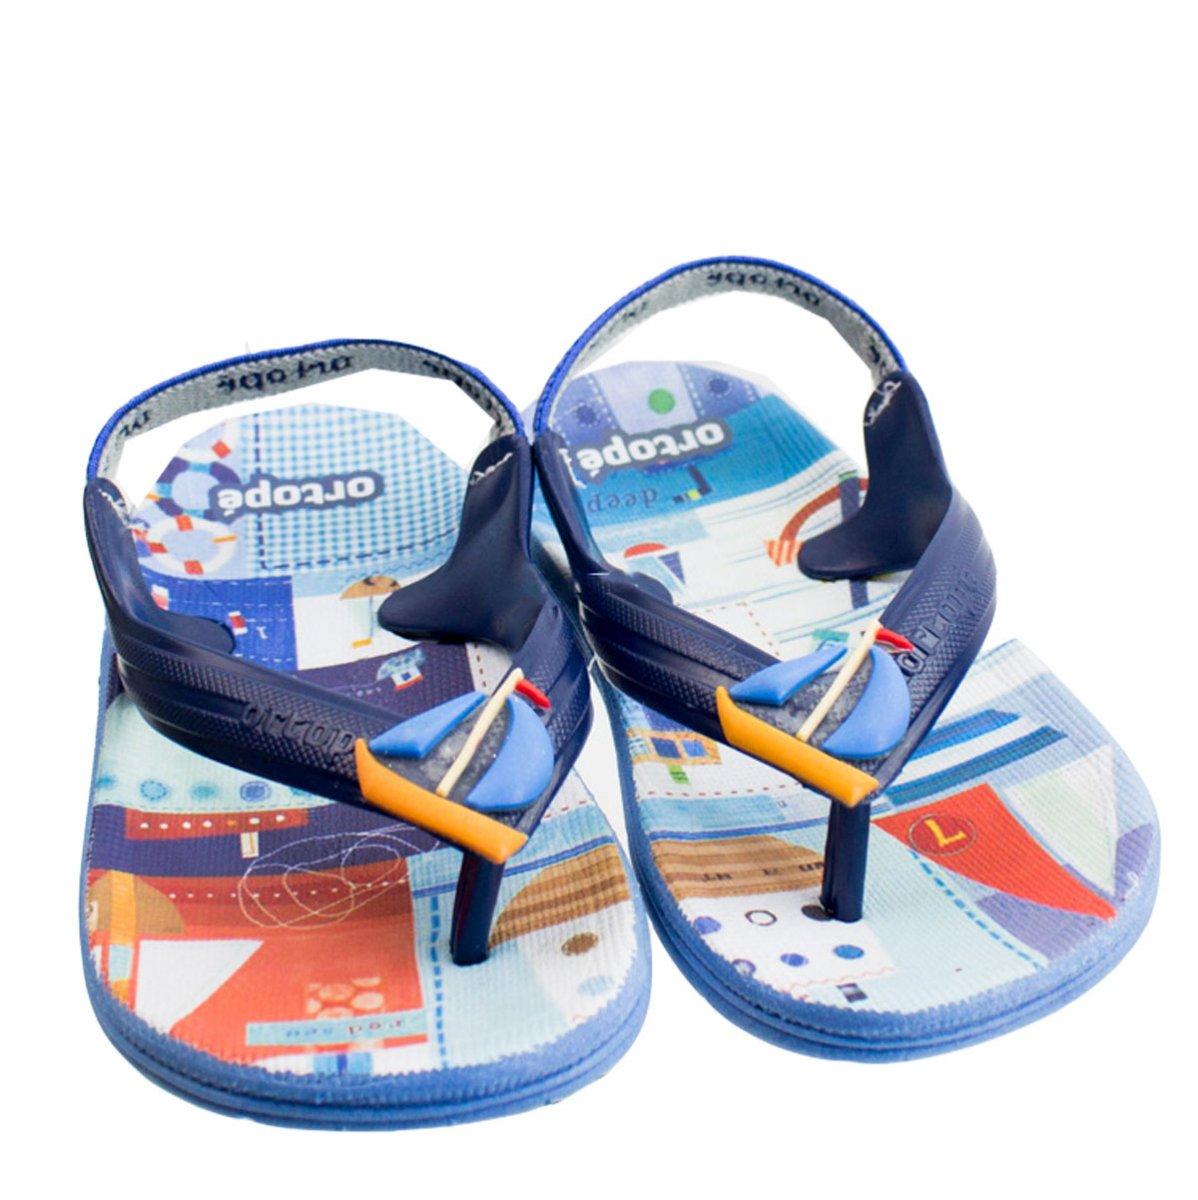 e5119f04a8ec9 Bizz Store - Chinelo Infantil Masculino Ortopé Aqua Flex PVC